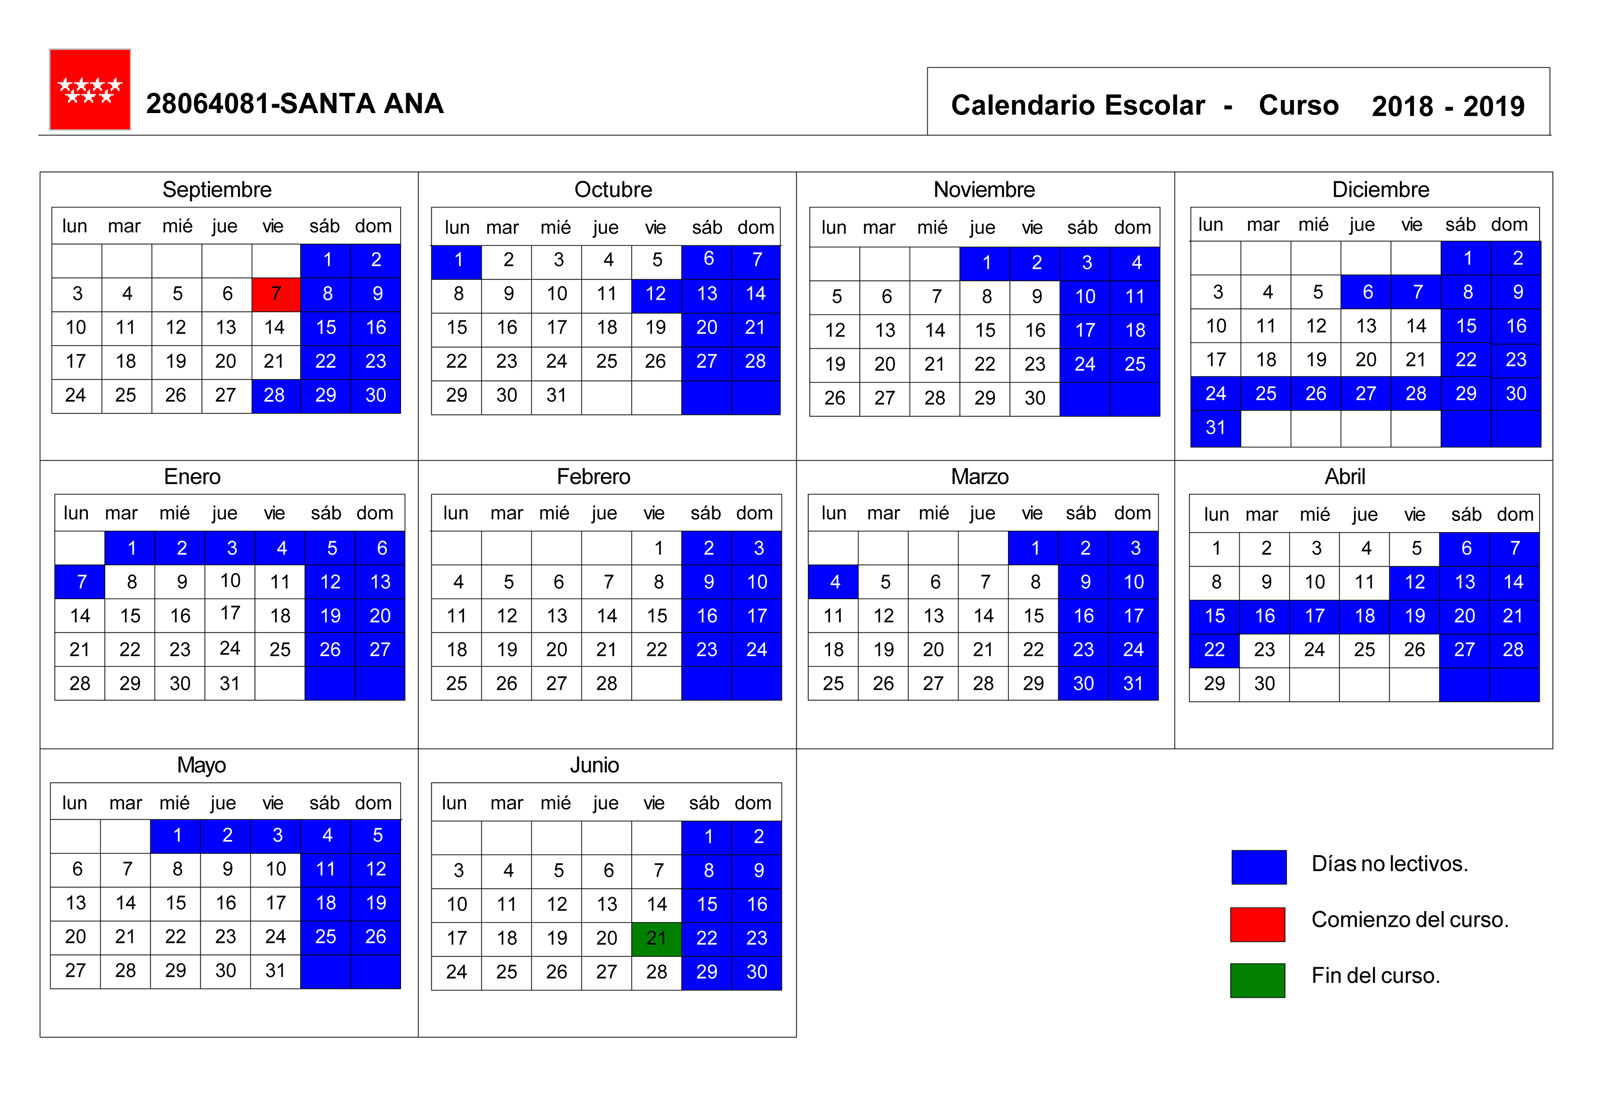 Calendario Escolar 2020 2019 Comunidad De Madrid.Calendario Escolar Cpb Santa Ana